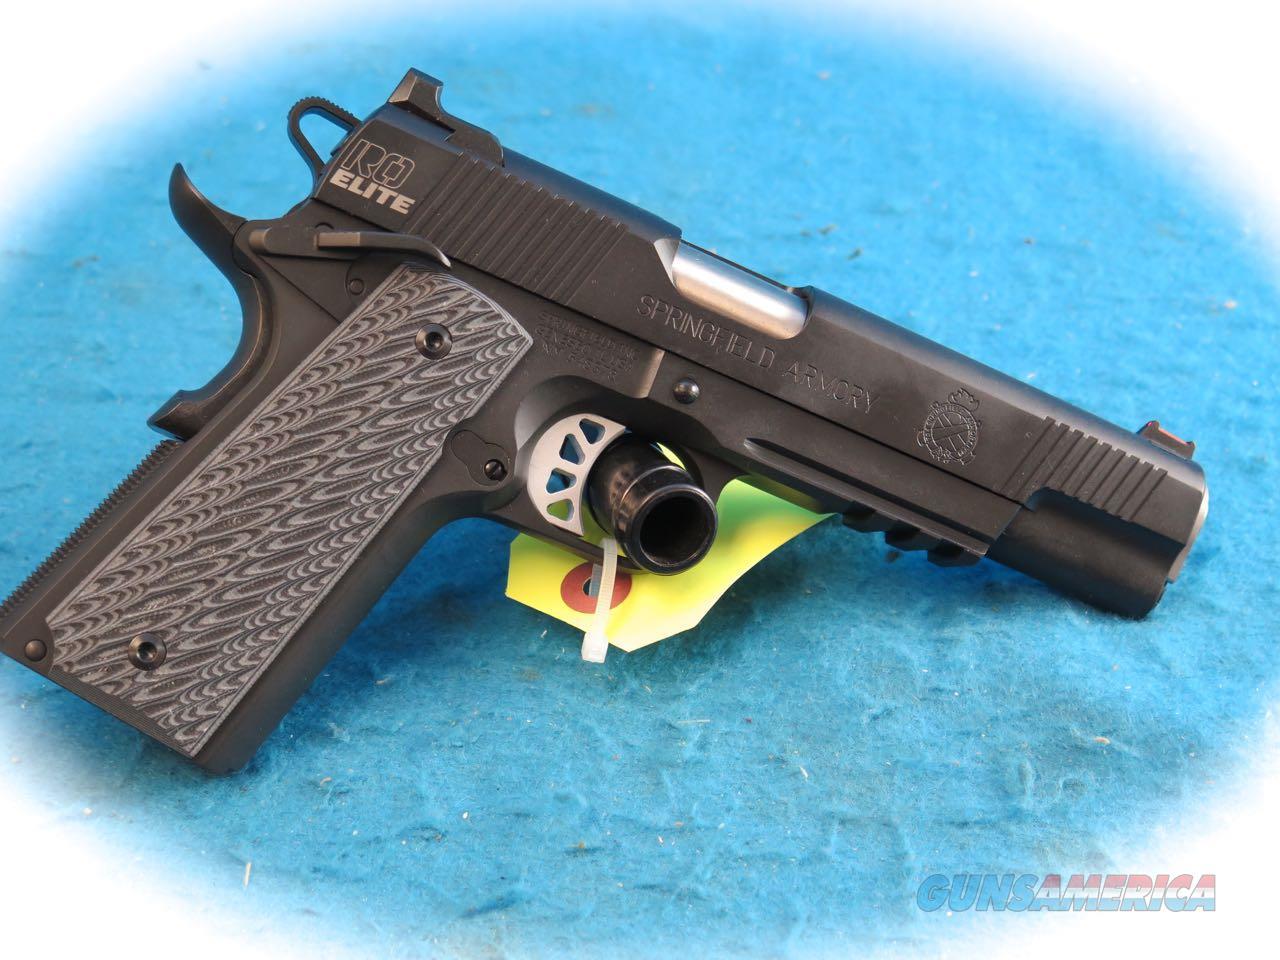 Springfield Armory 1911 Range Officer Elite Pistol Model PI9130E **New**  Guns > Pistols > Springfield Armory Pistols > 1911 Type